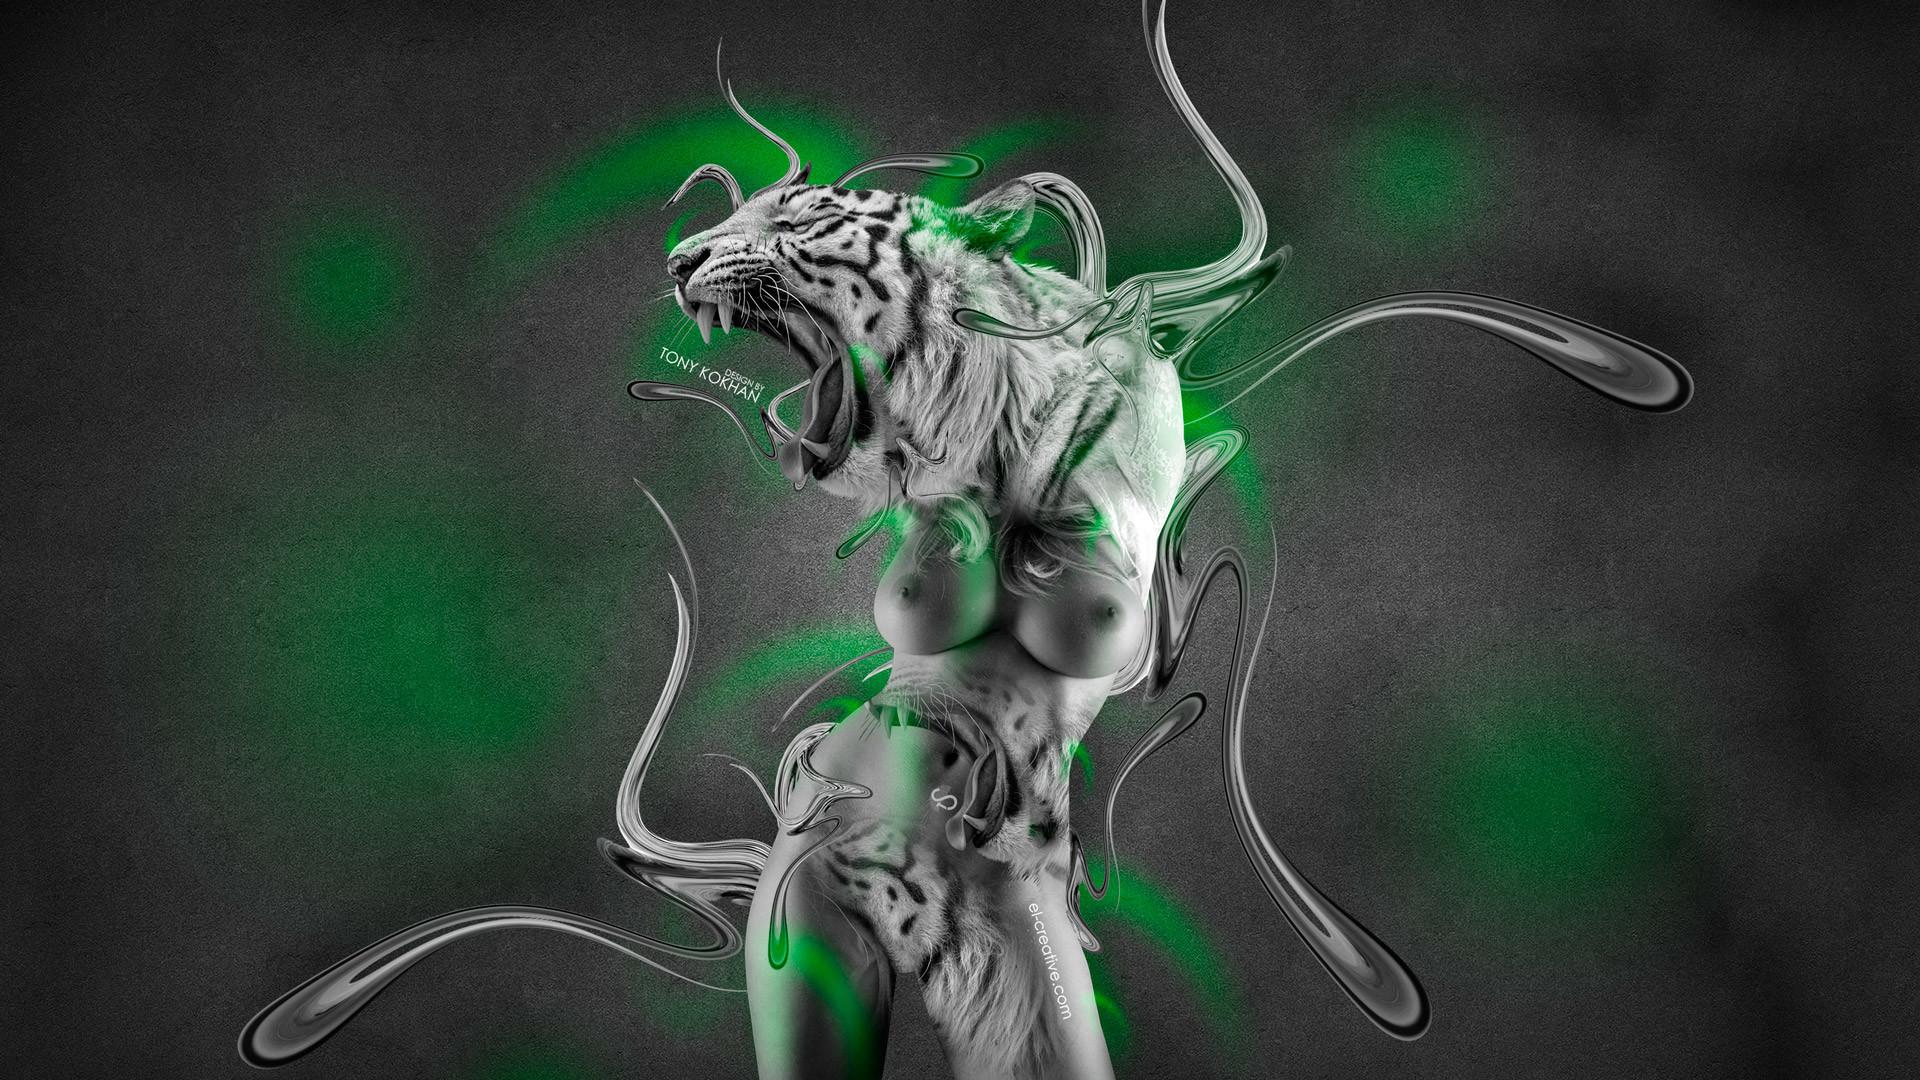 … Fantasy-Tiger-Plastic-Blonde-Girl-2014-Green-Neon- …